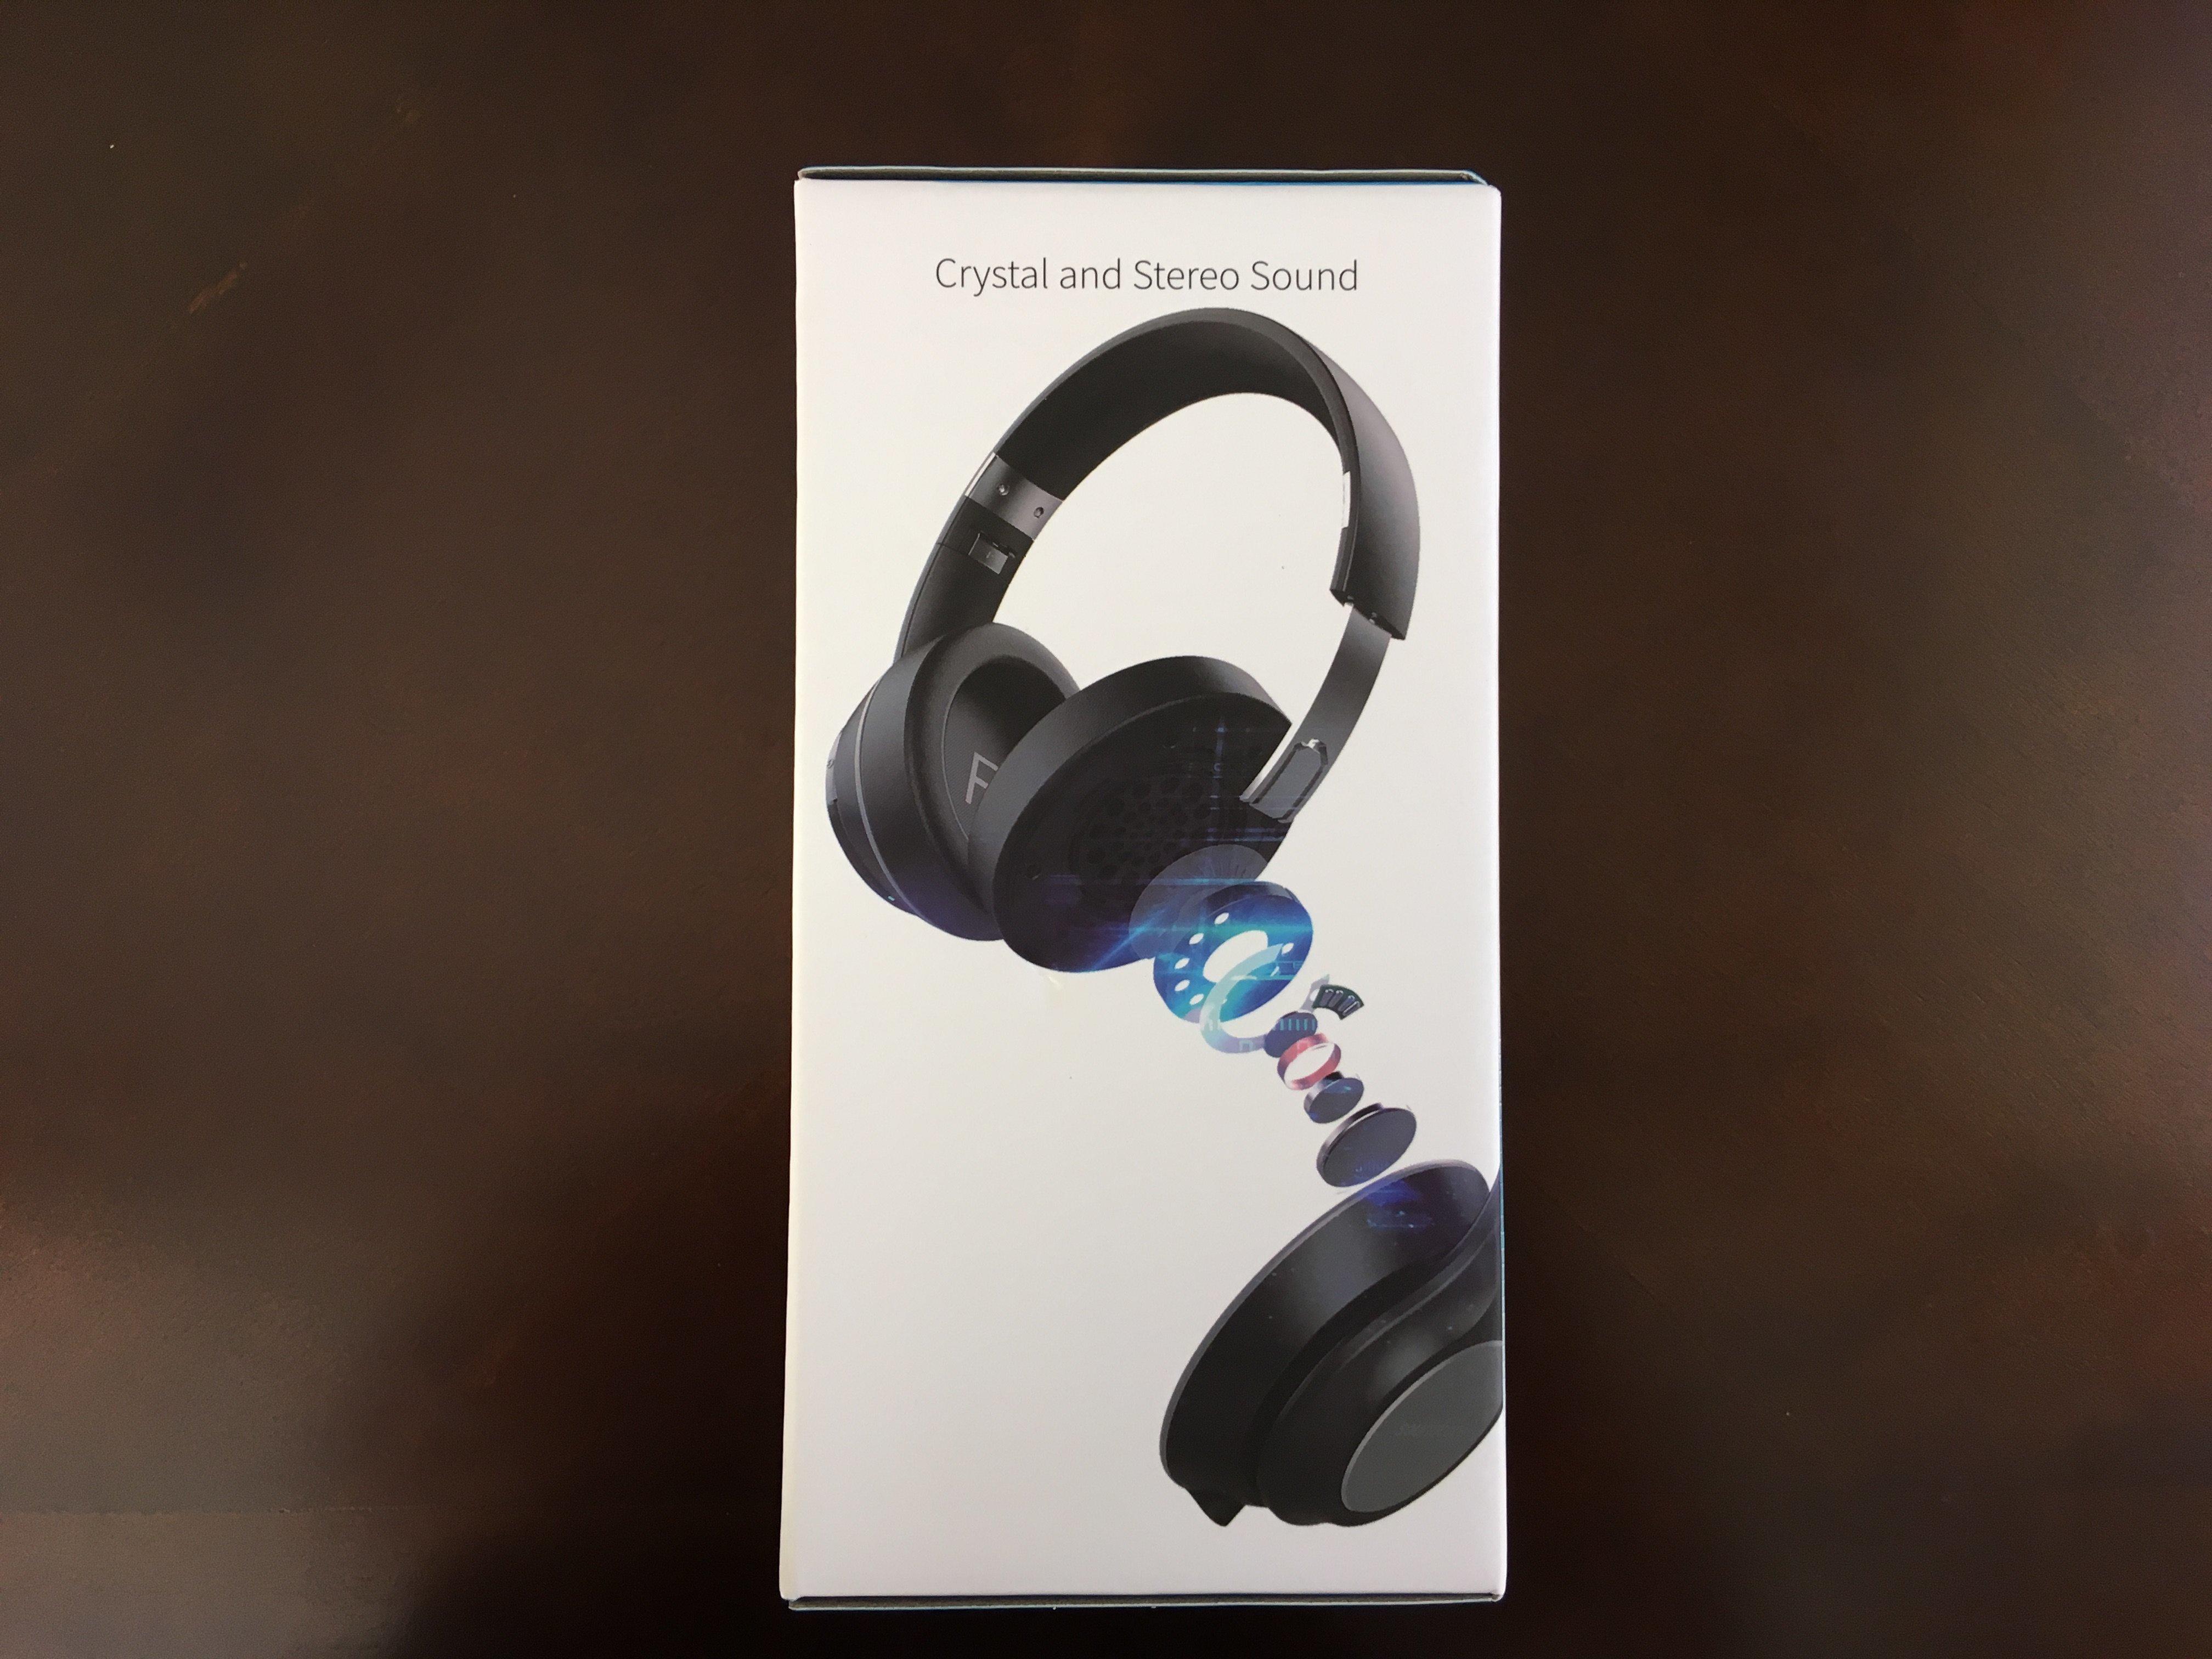 dc6c31efeda Soundcore Vortex Wireless Over-Ear Headphones - Product Reviews ...